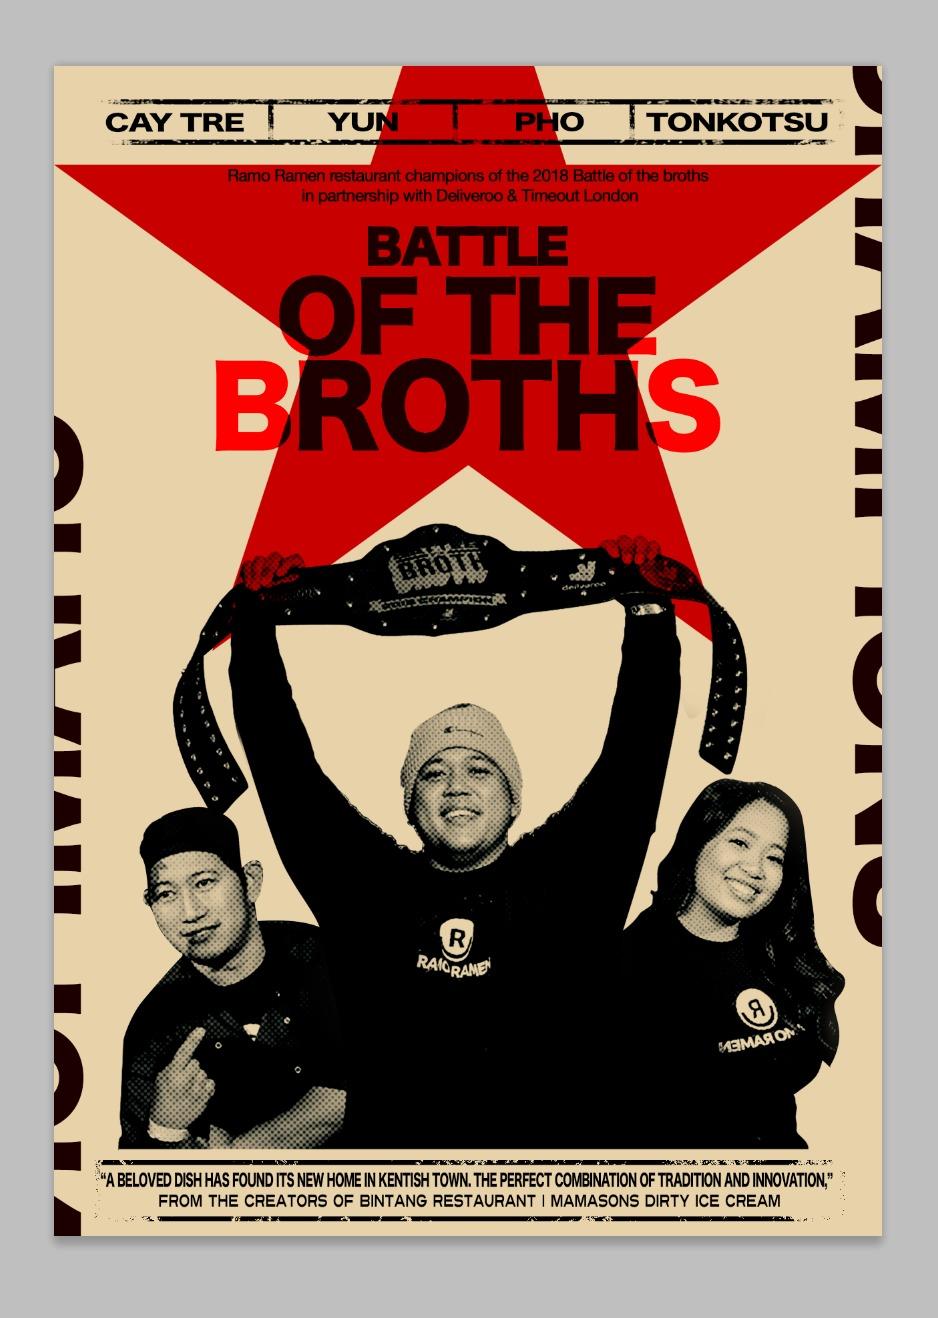 battle_of_the_broths_ramo_ramen.JPG